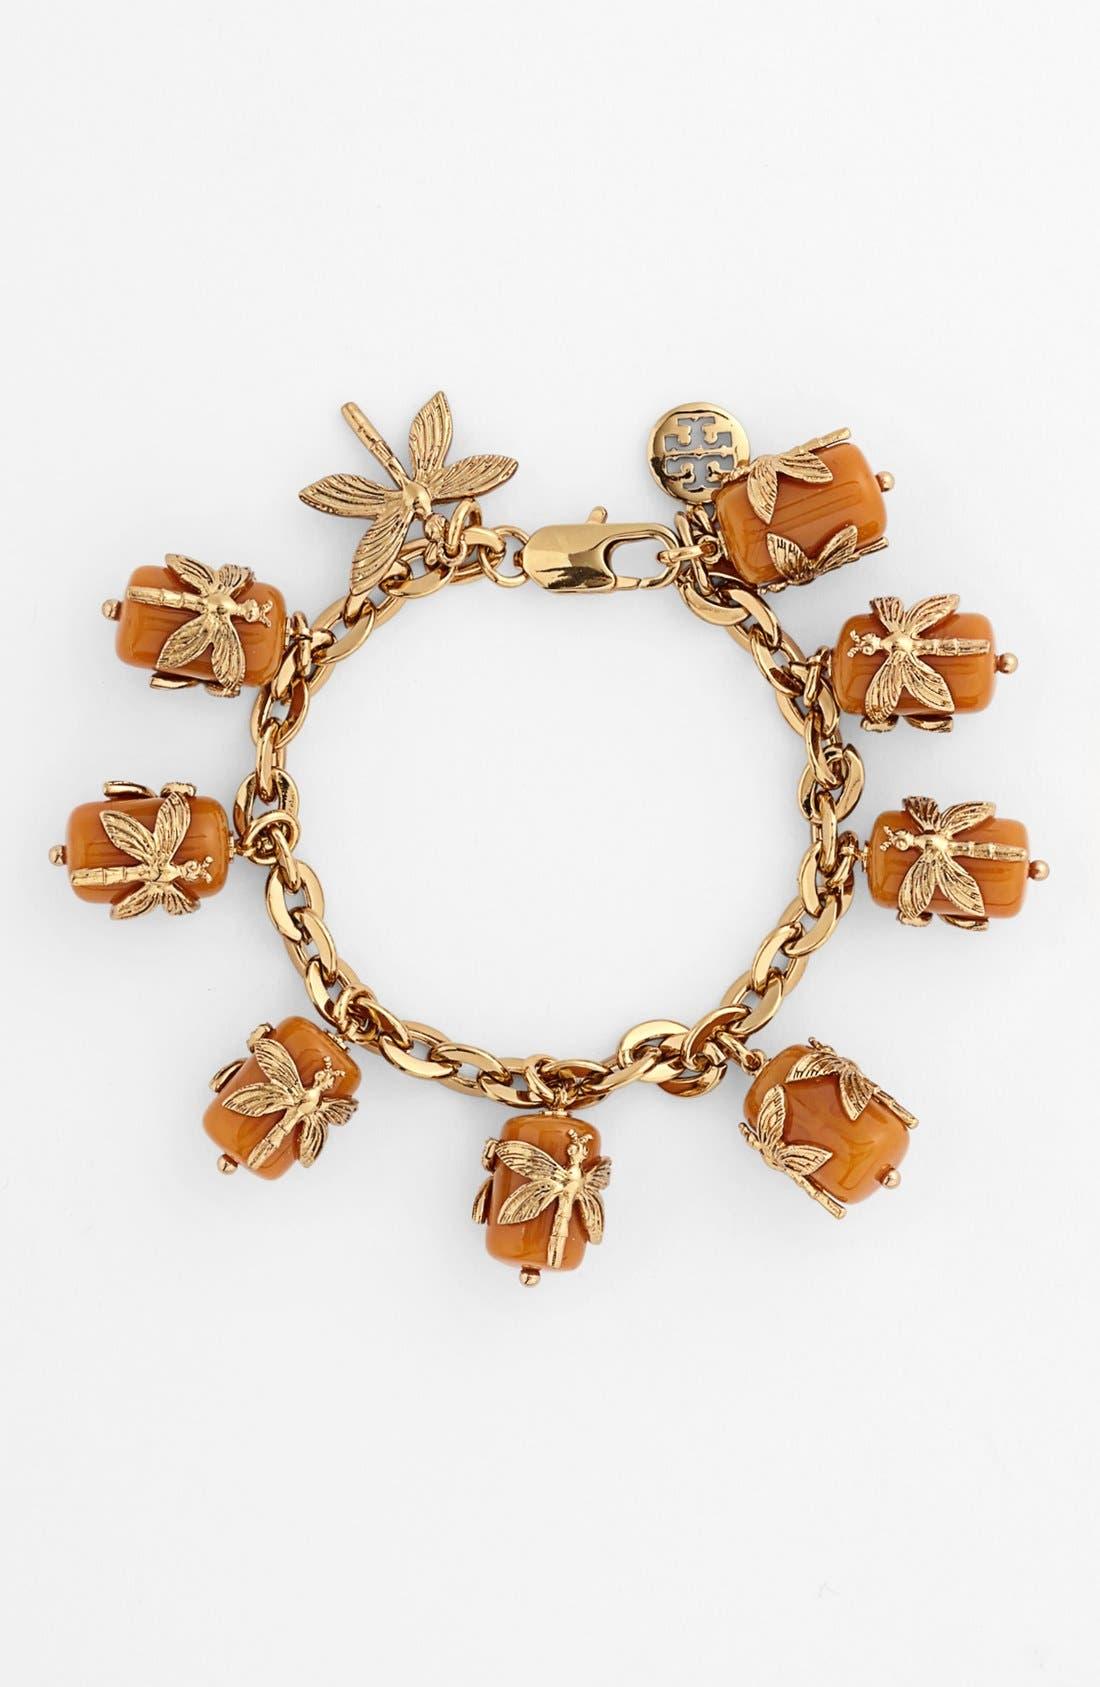 Alternate Image 1 Selected - Tory Burch Dragonfly Charm Bracelet